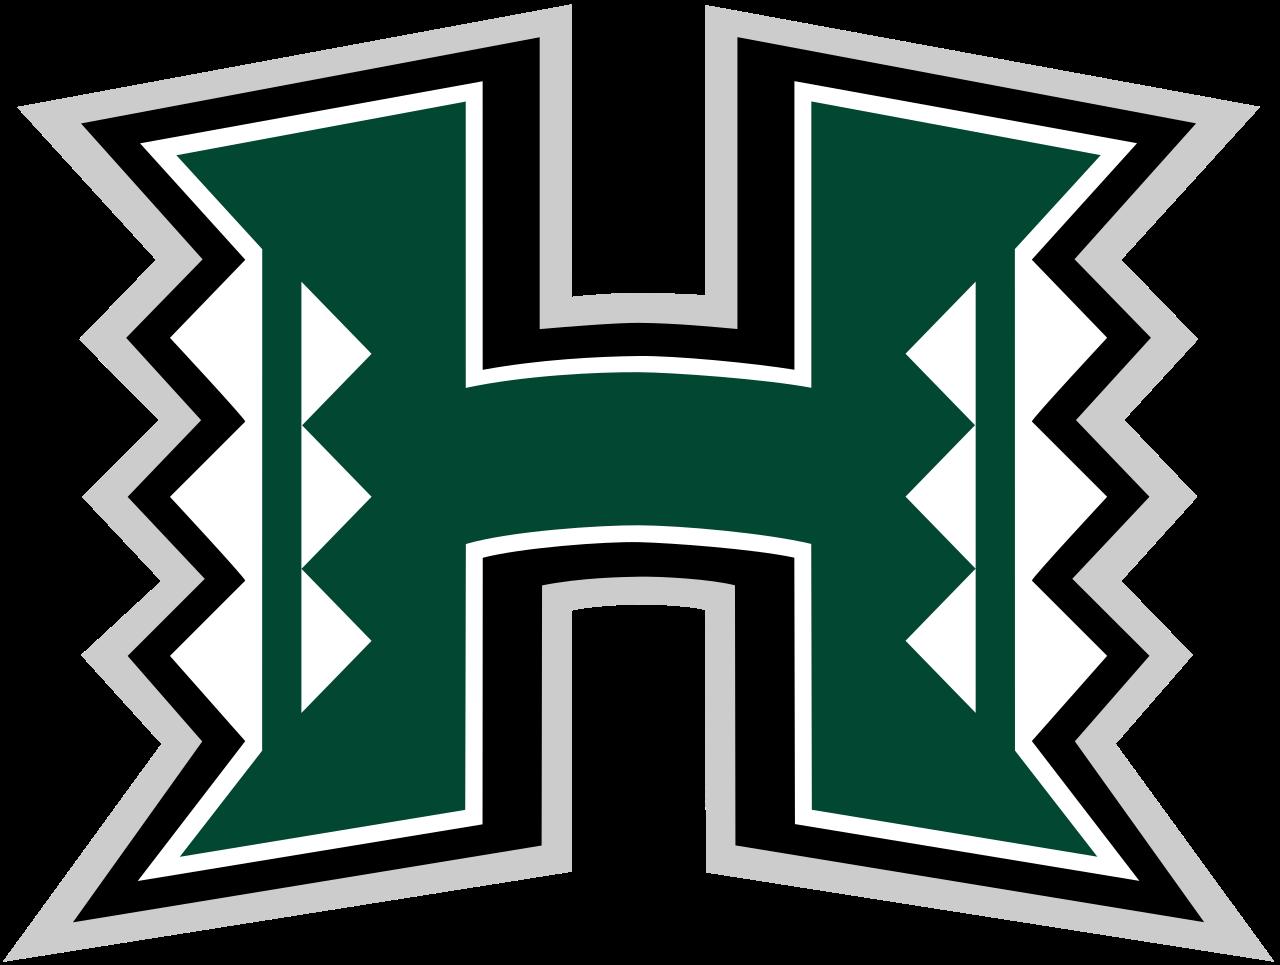 File:Hawaii Warriors logo.svg.